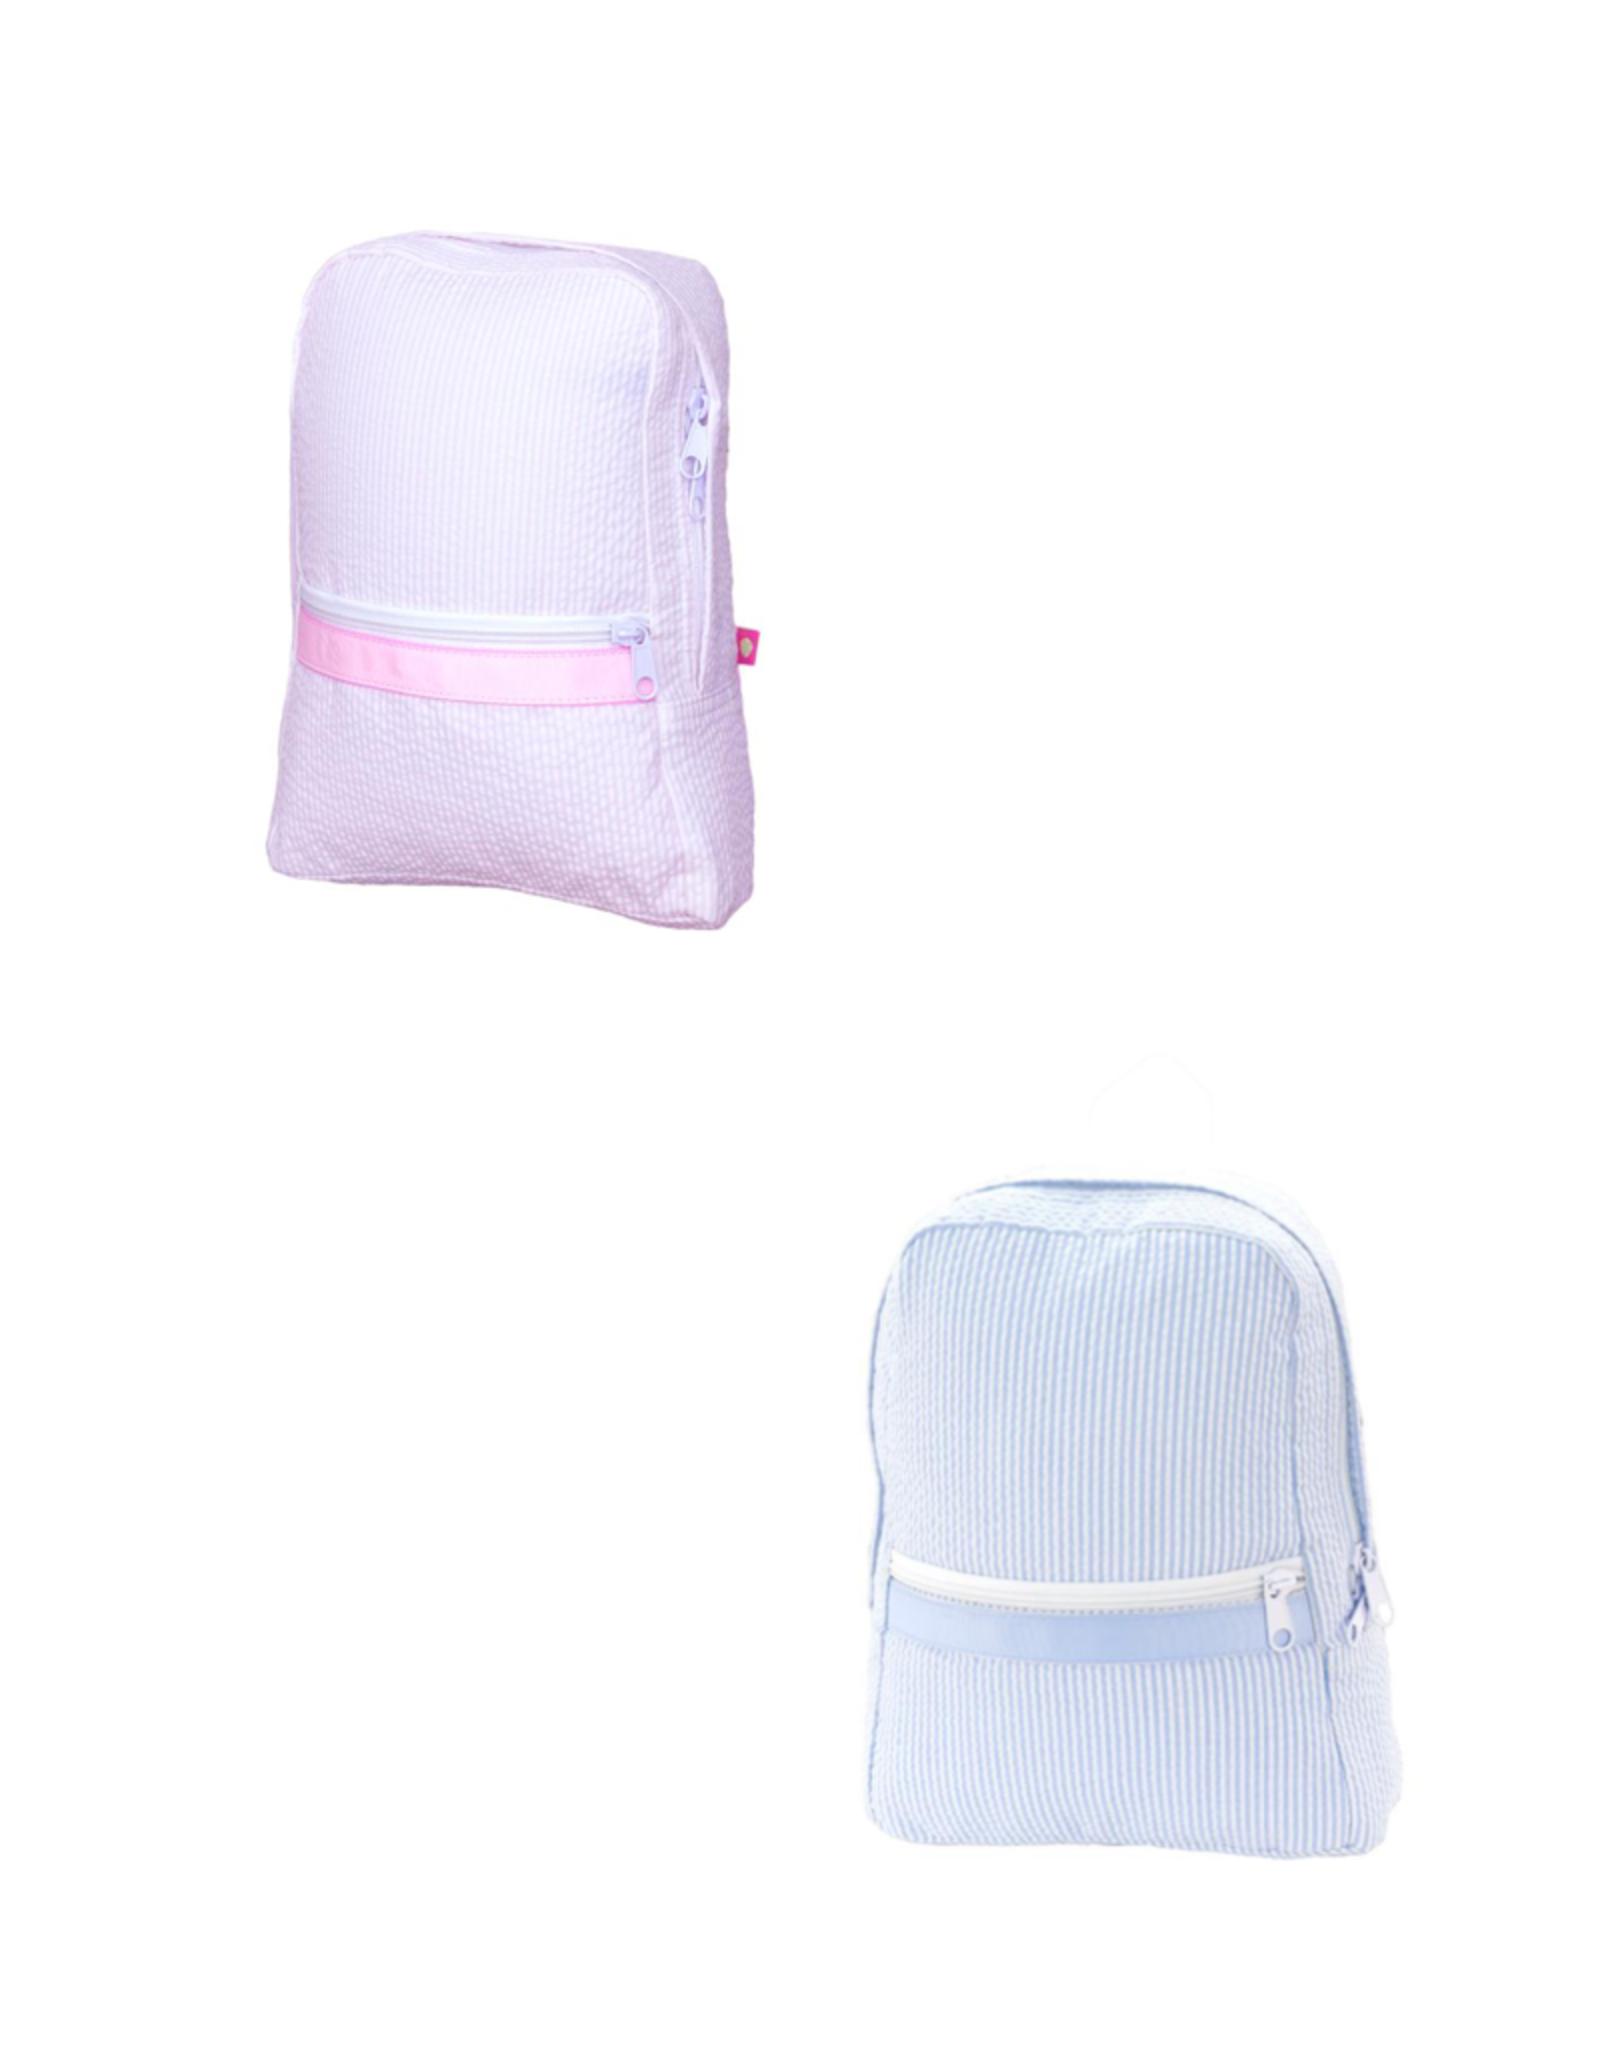 Mint Seersucker Small Backpack